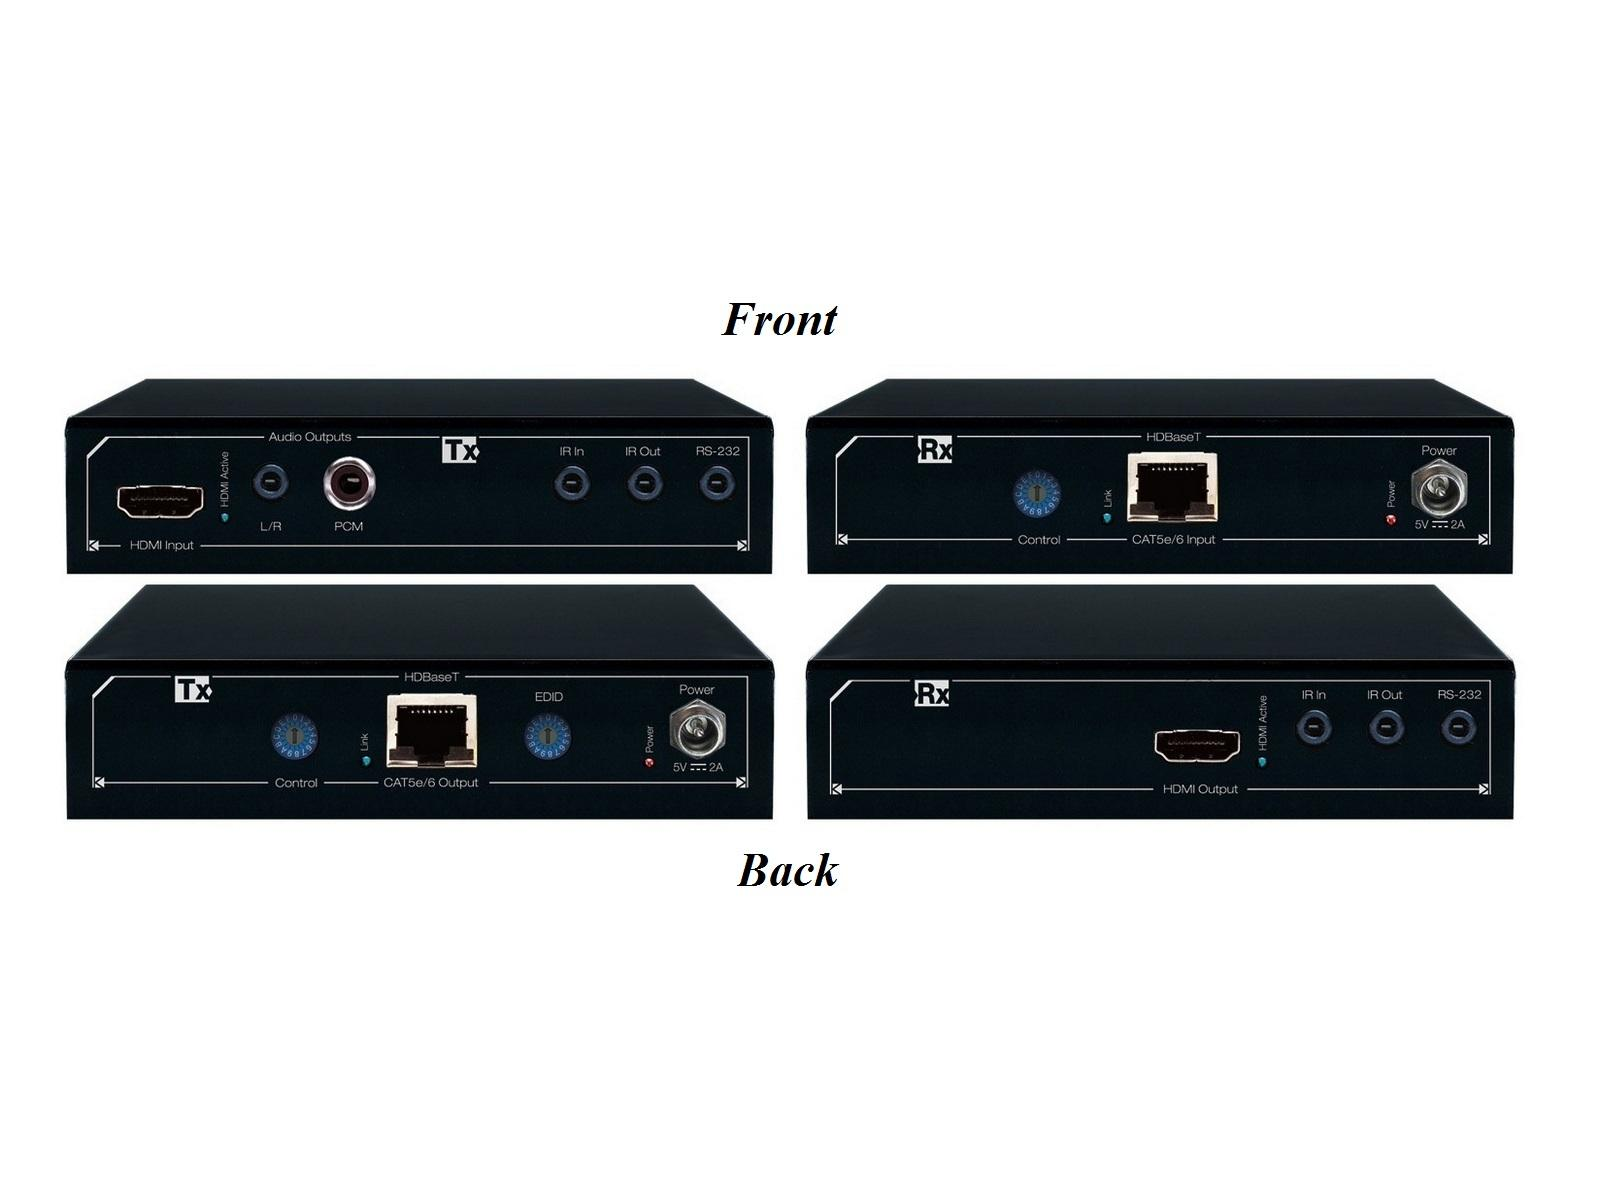 Key Digital KD-X411ProK HDMI via CAT5e/6 Extender (Transmitter/Receiver) Kit with Audio De-Embedding